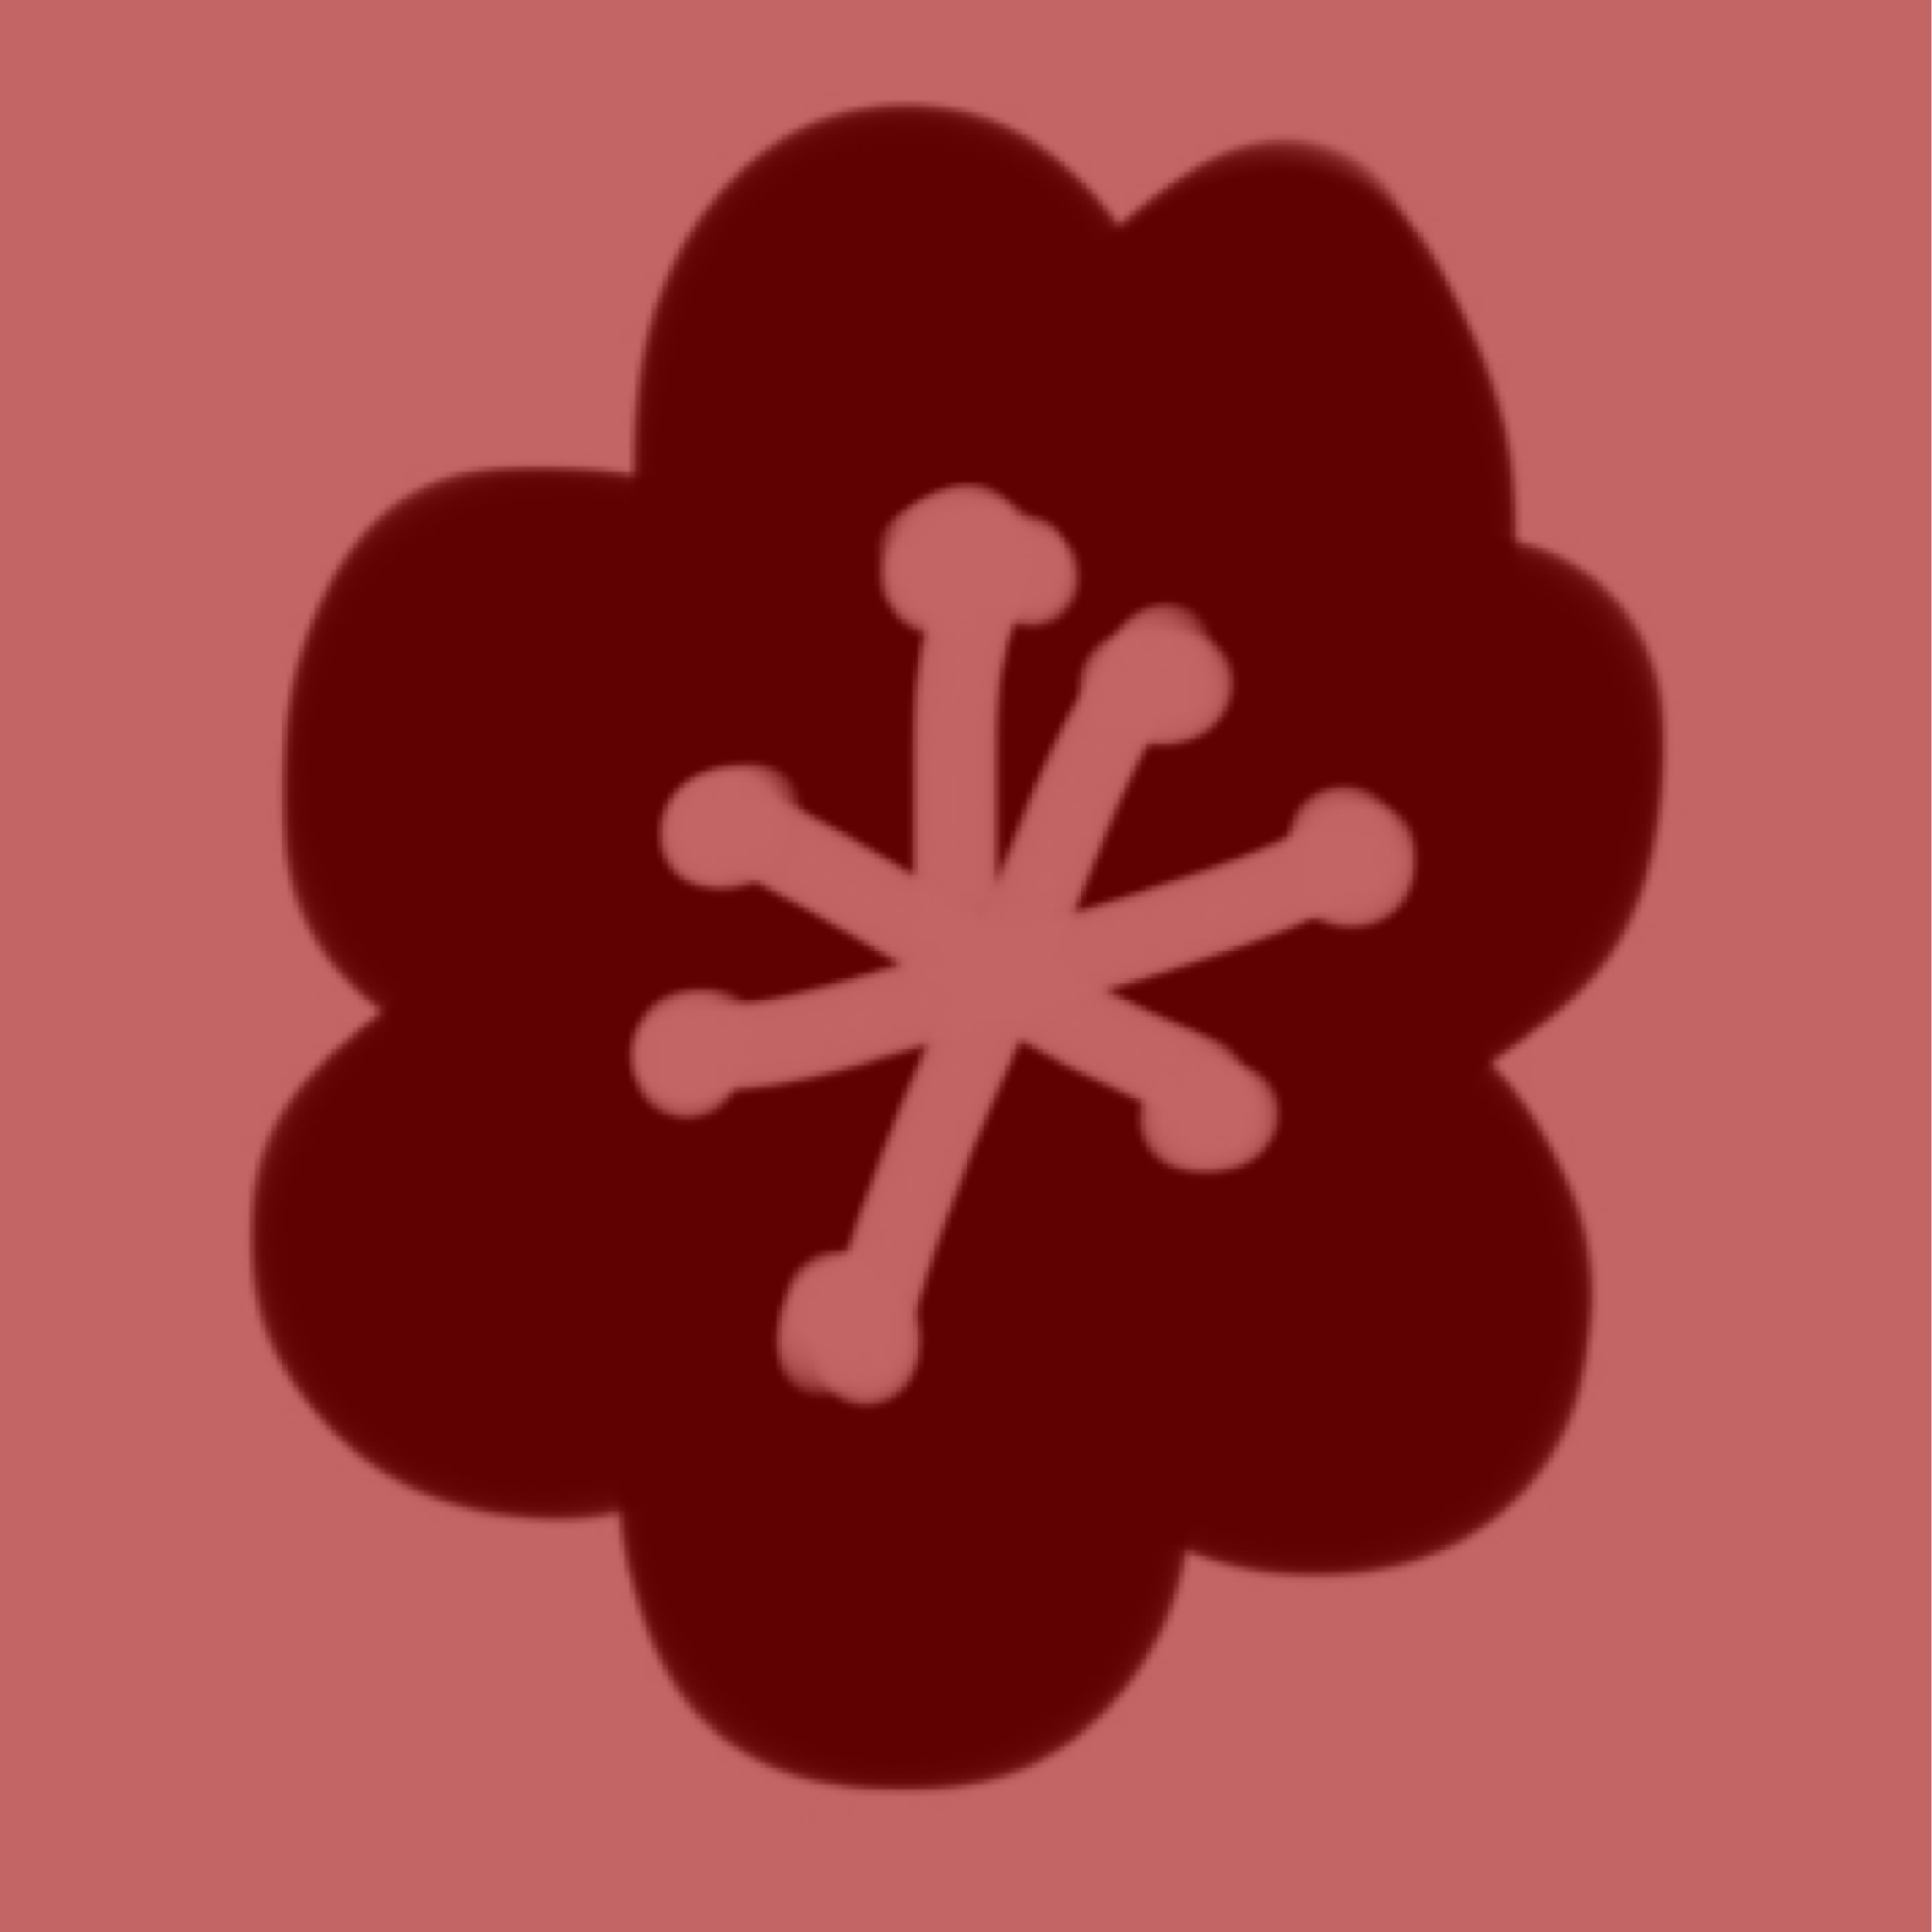 Red Opium Poppy, for Impetus!